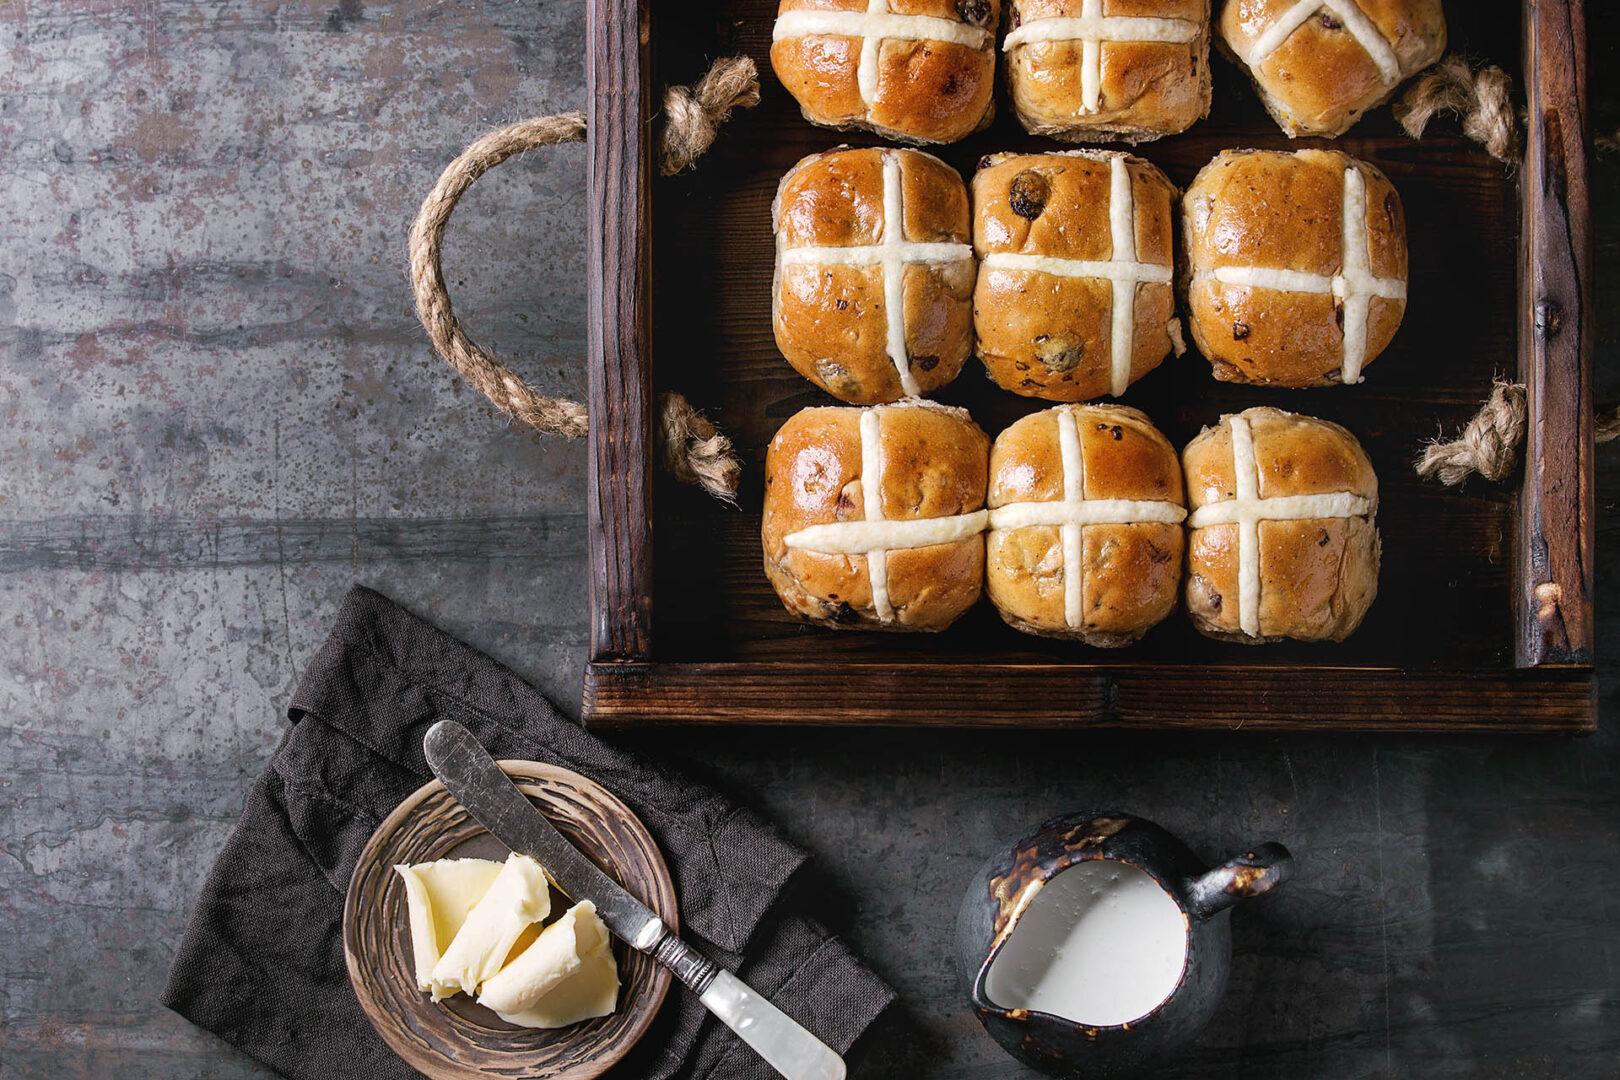 hot-cross-buns-at Cresta Court Hotel Altrincham Cheshire Borders